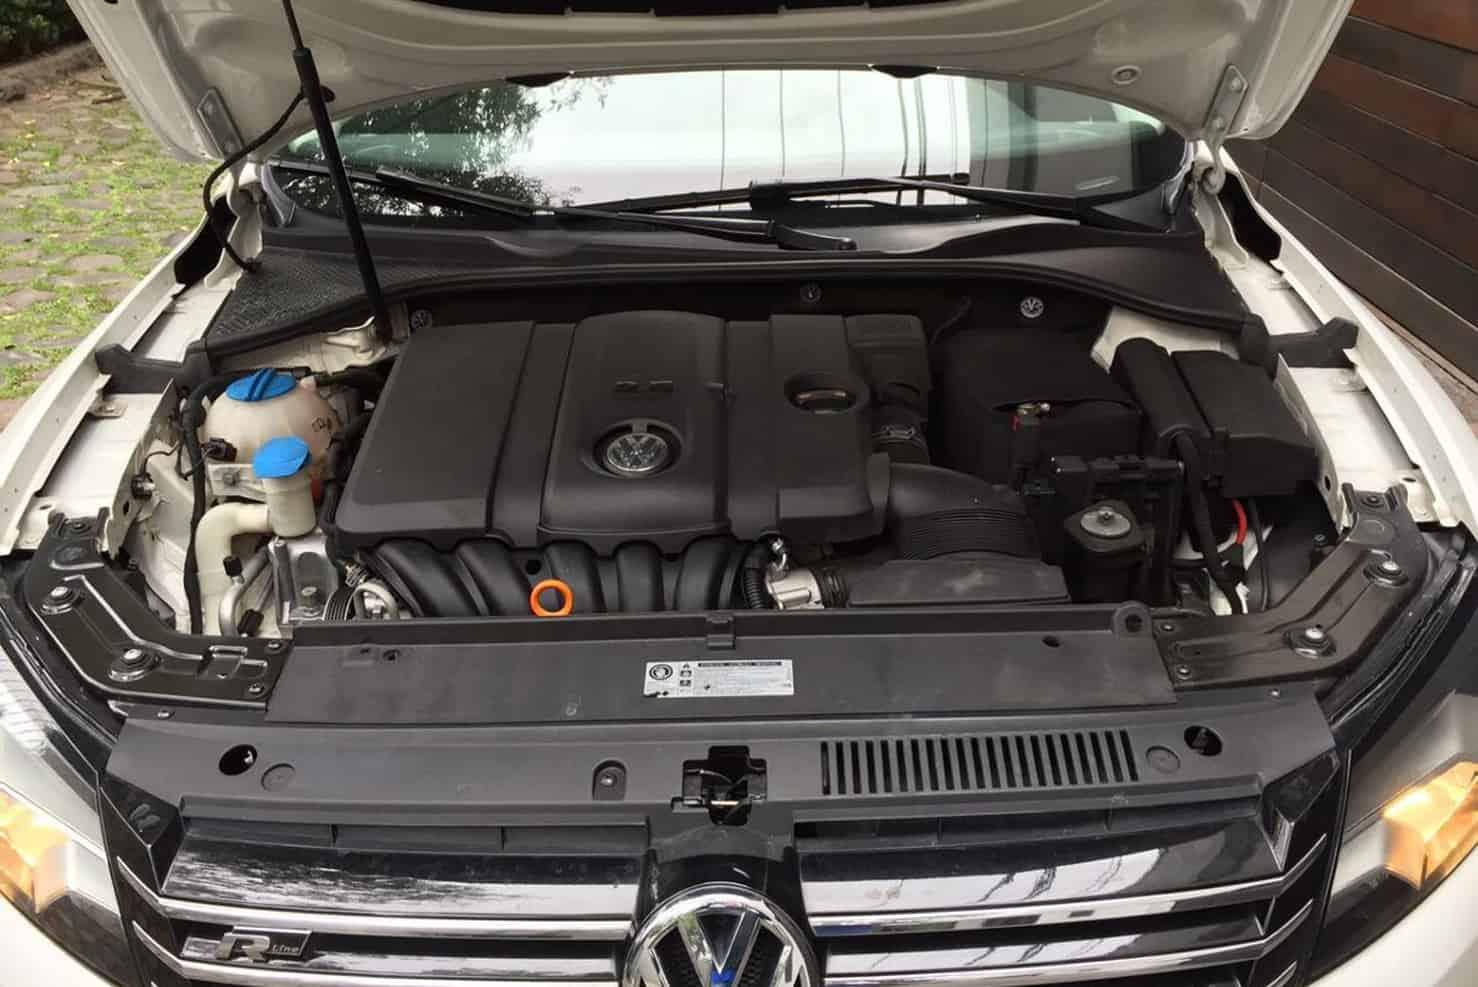 Volkswagen Passat Engine | BBB Rent a Car